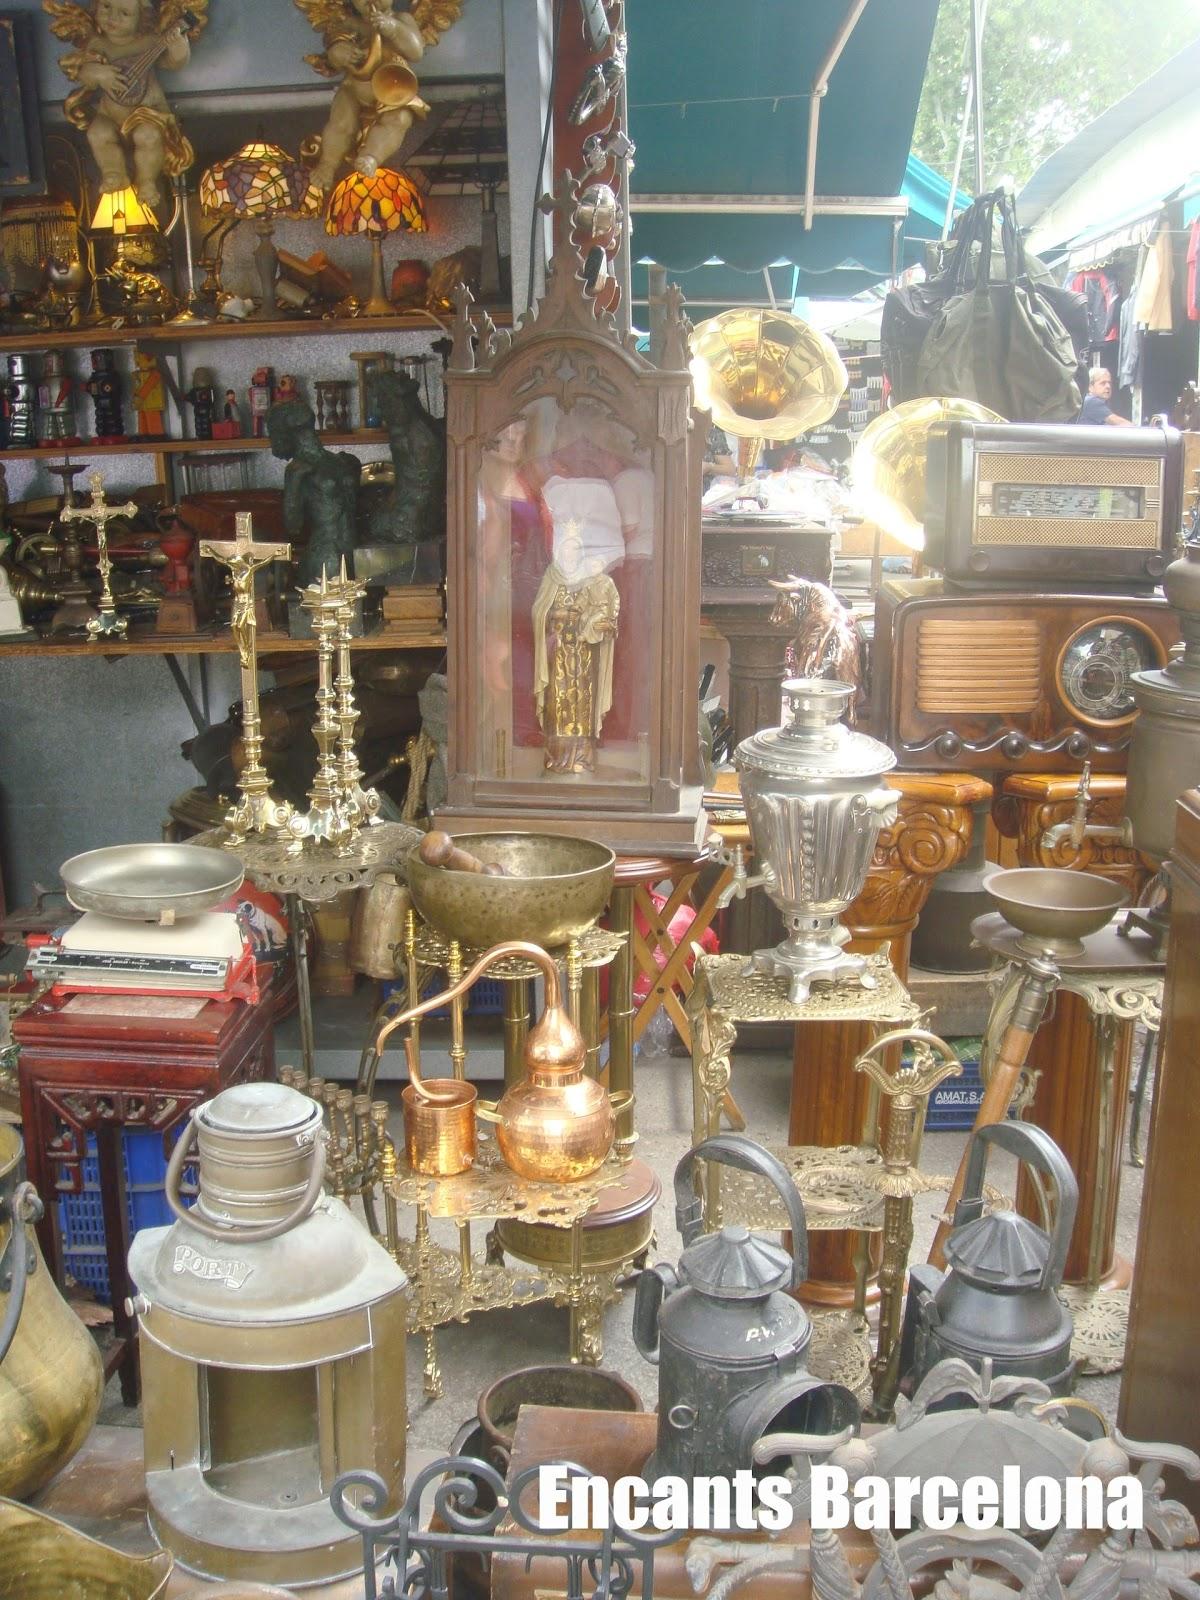 Los Encantes, Encants, Barcelona, Elisa N, Blog de Viajes, Lifestyle, Travel